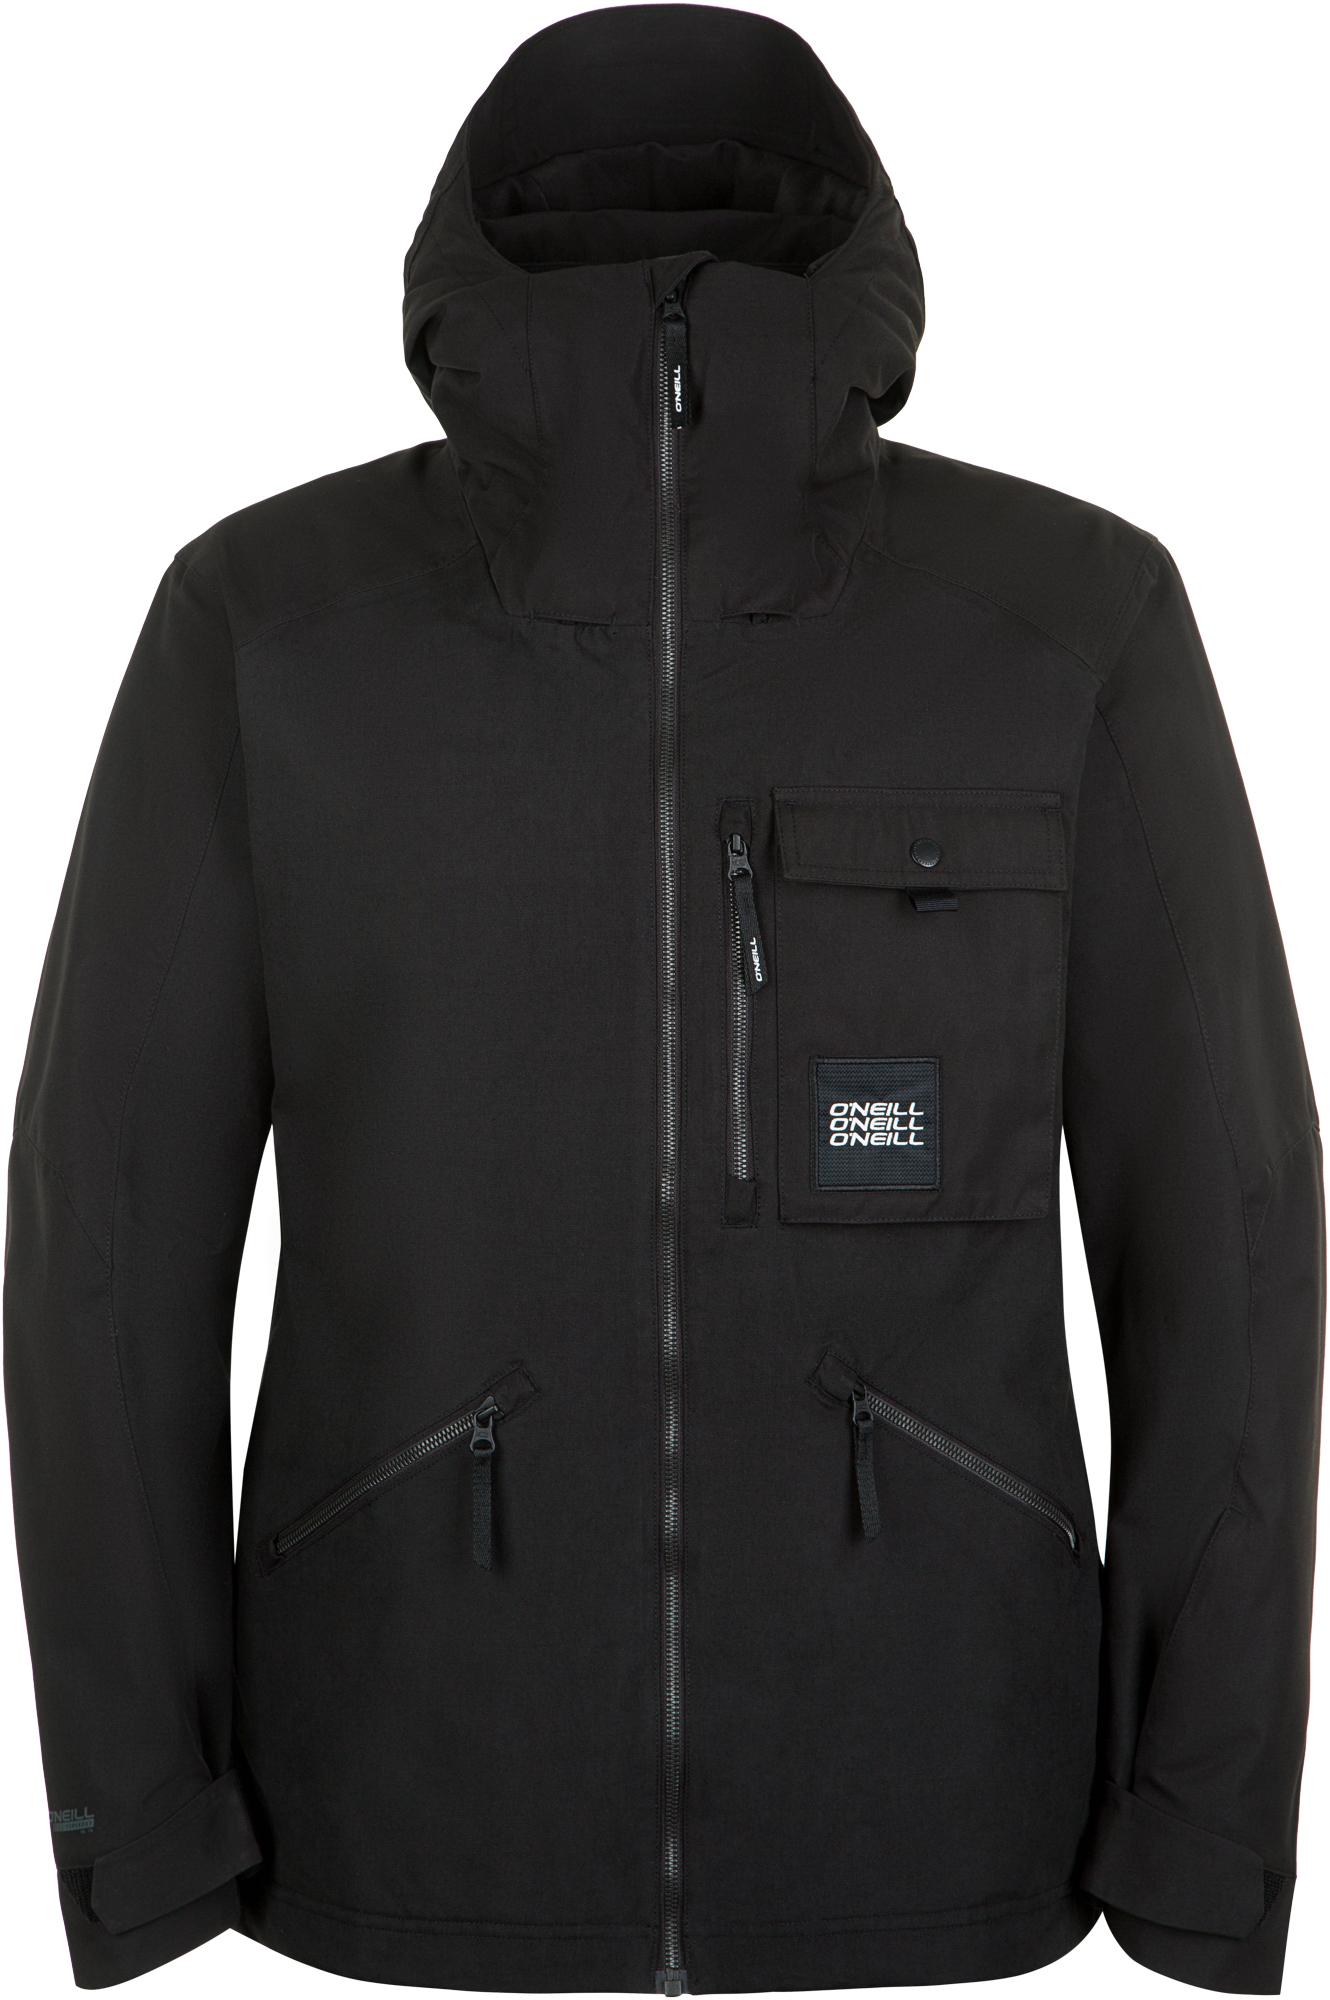 O'Neill Куртка утепленная мужская O'Neill Pm Utlty, размер 52-54 цены онлайн